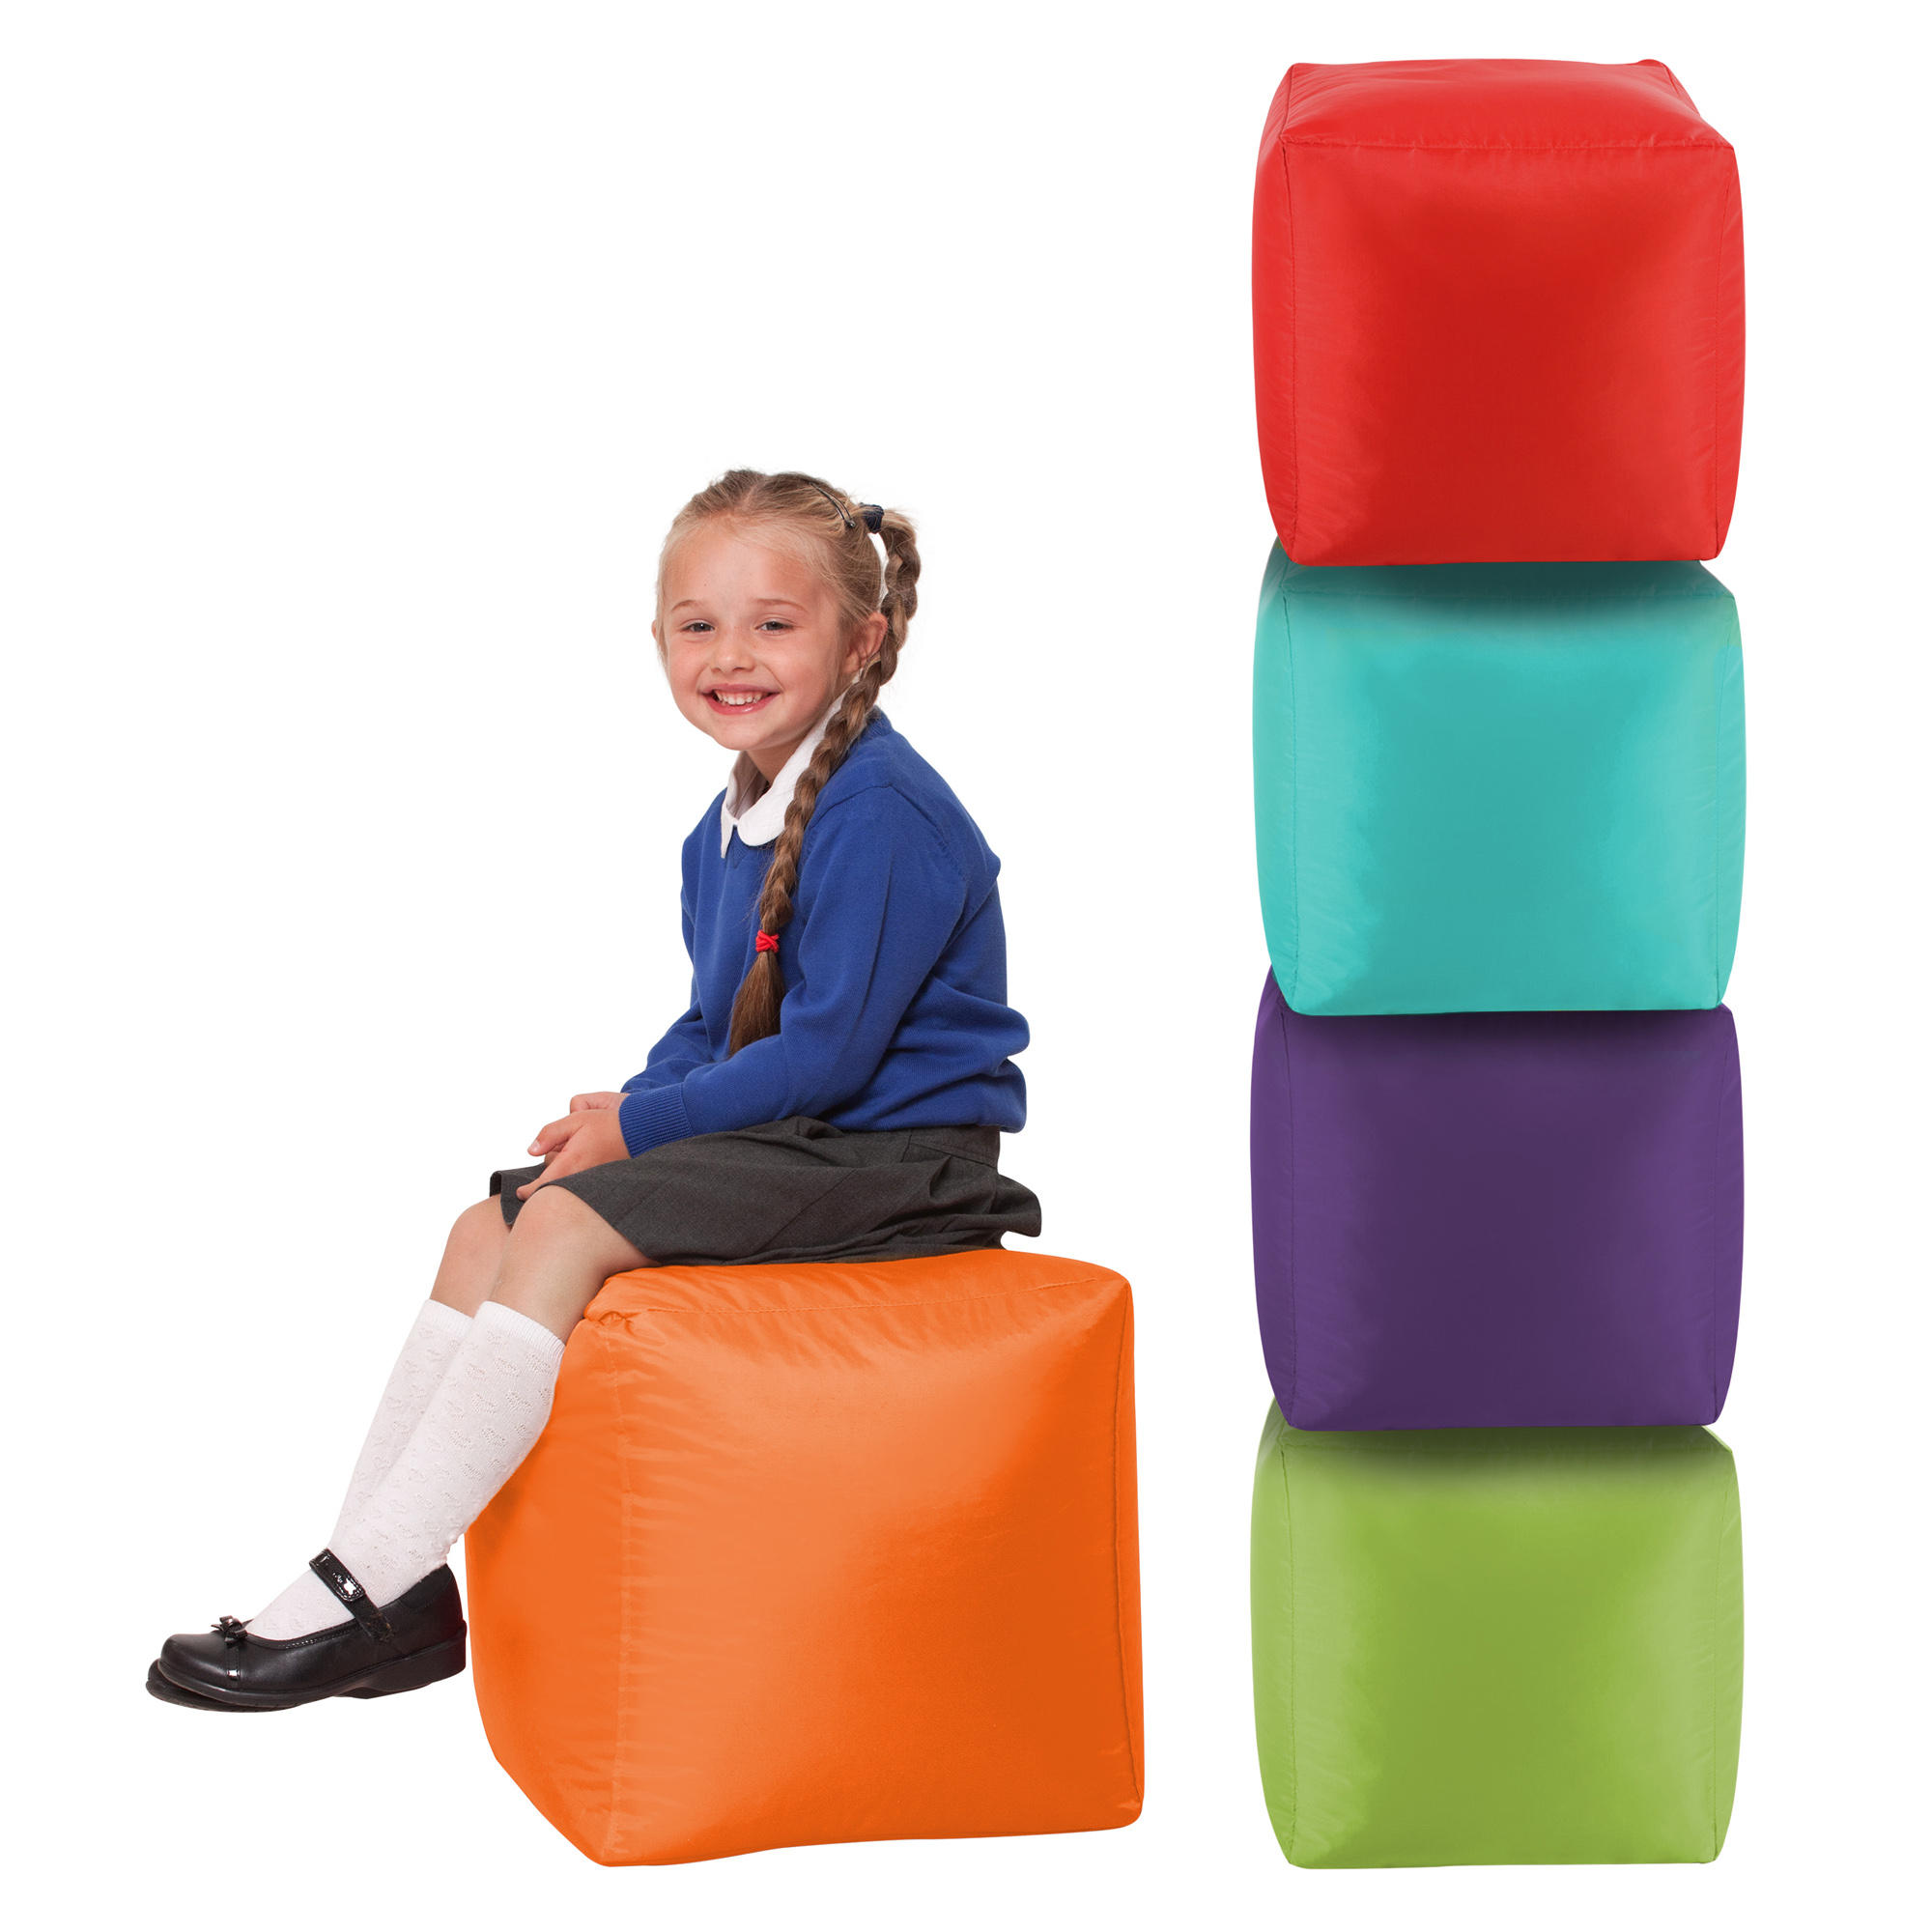 Eden-Classroom-Cube-OD-ypo